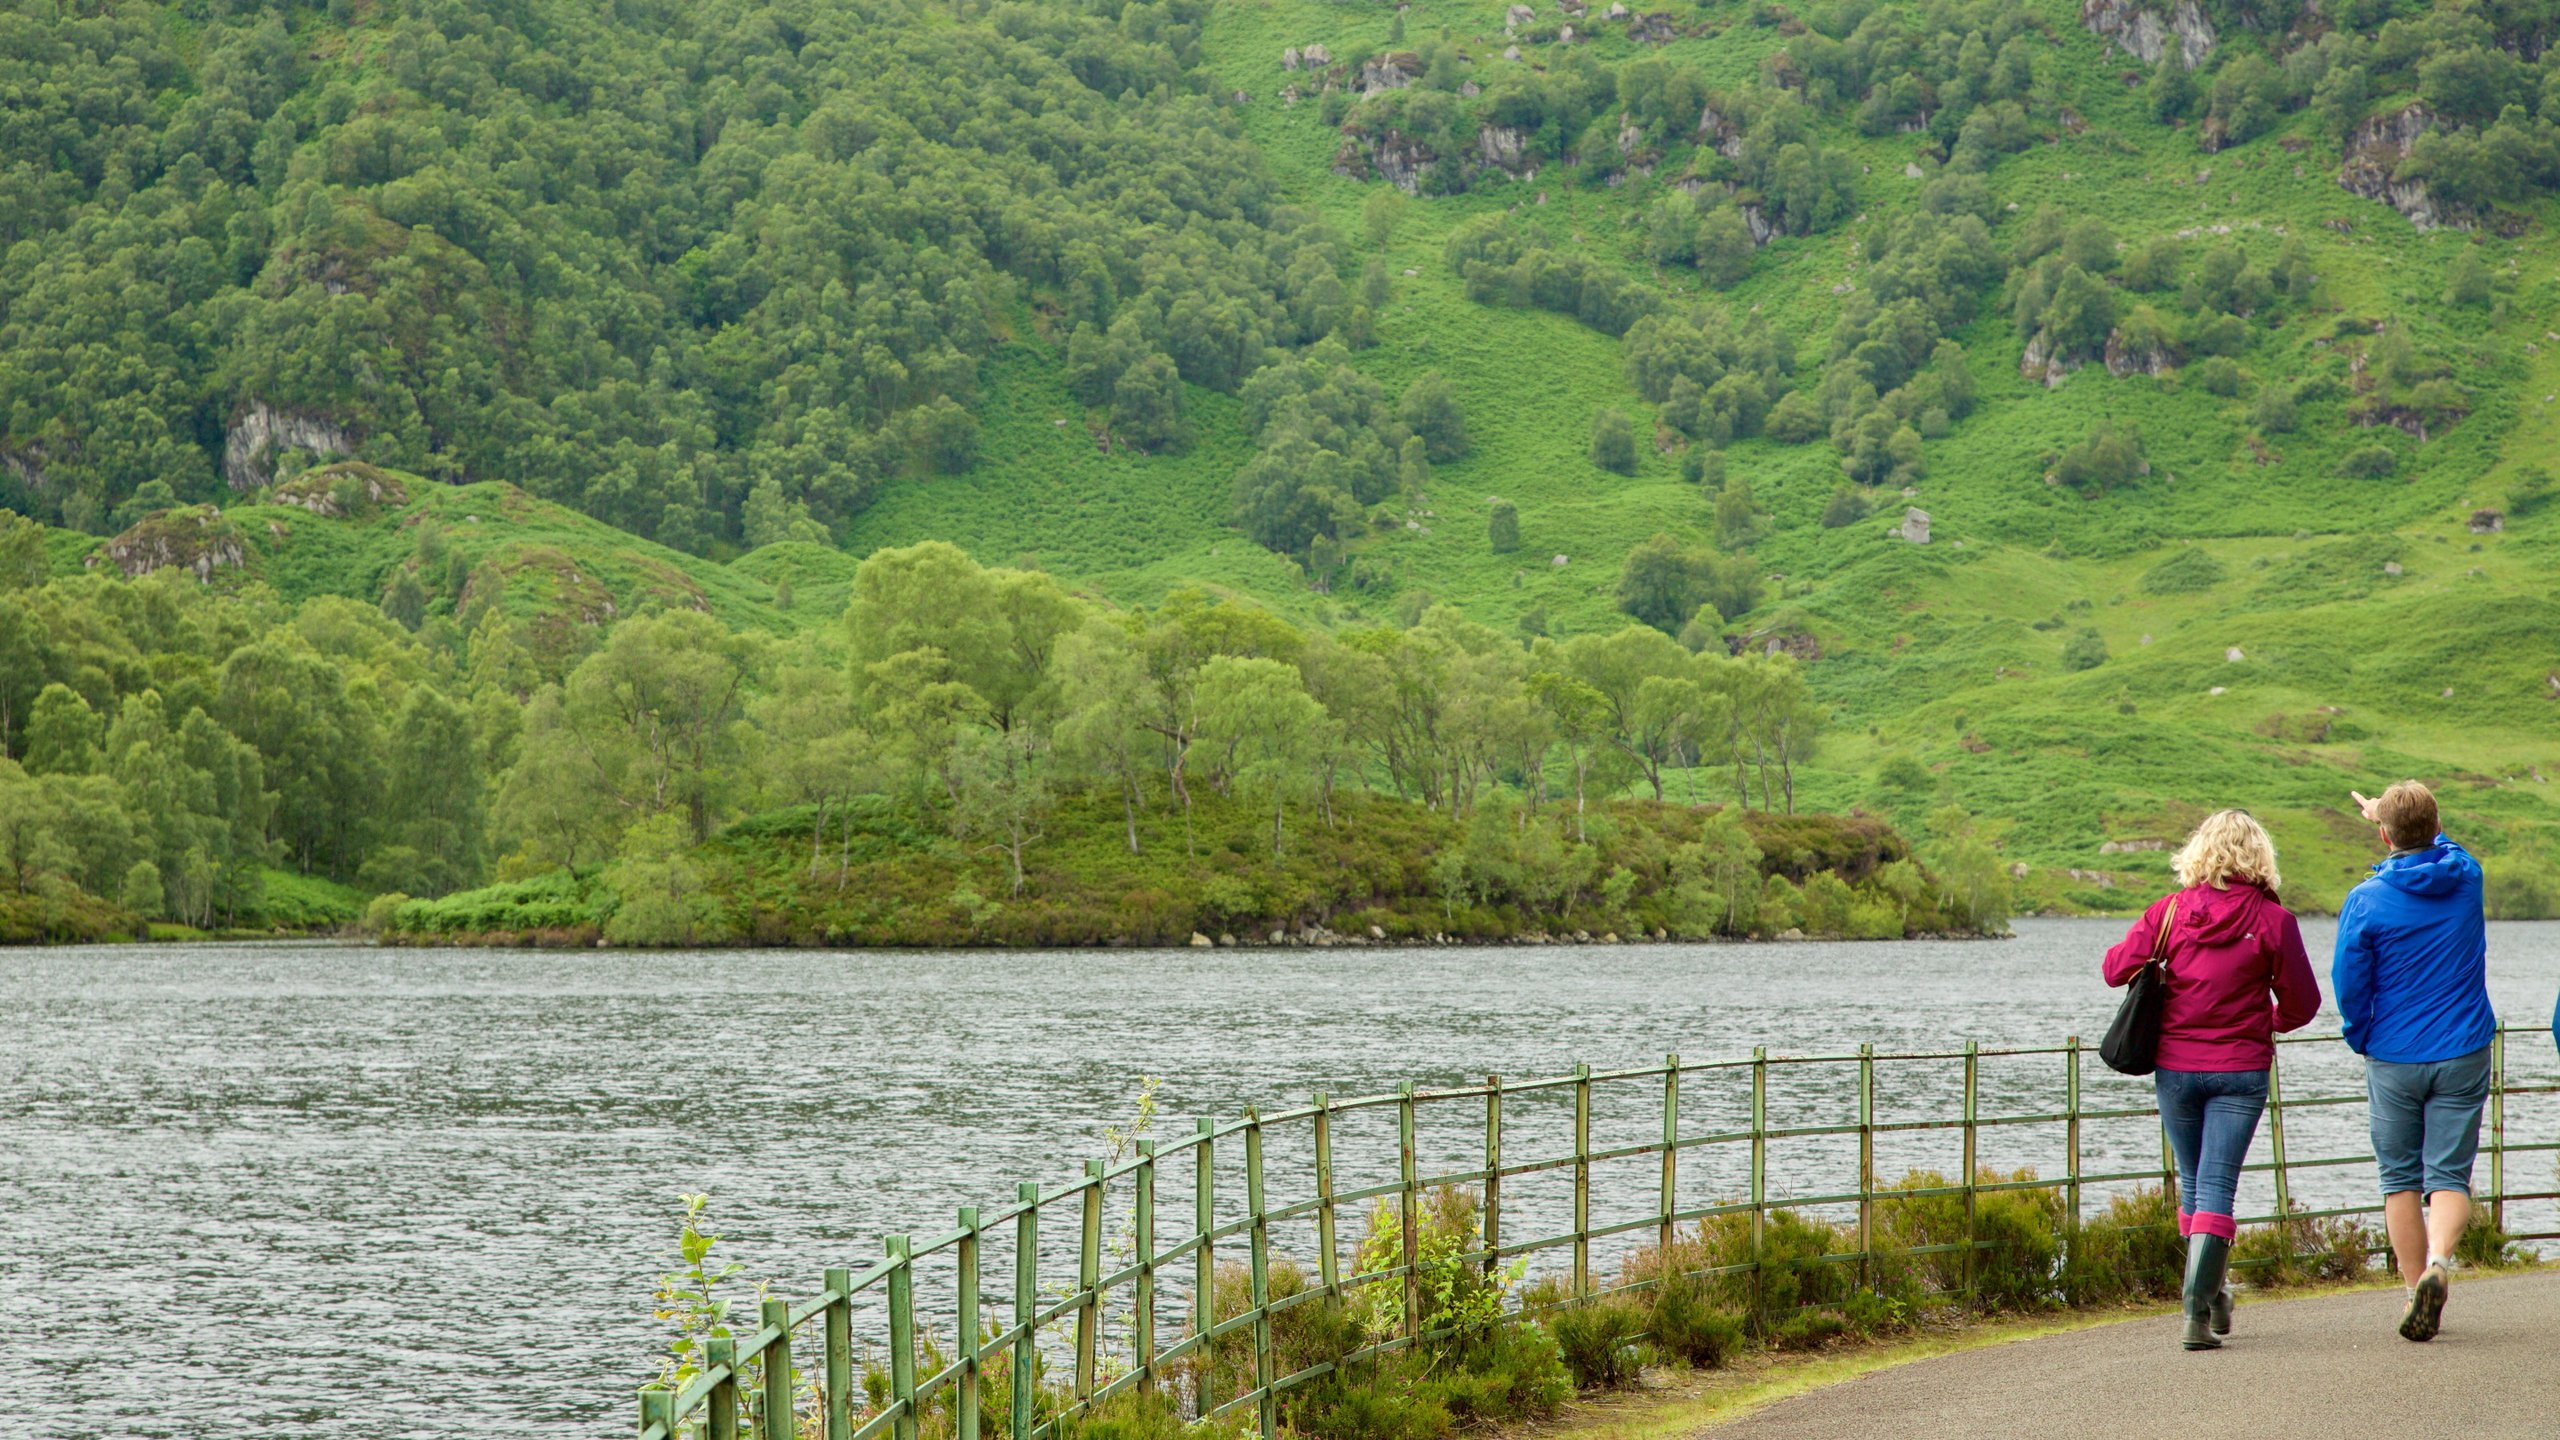 Loch Katrine, Callander, Scotland, United Kingdom